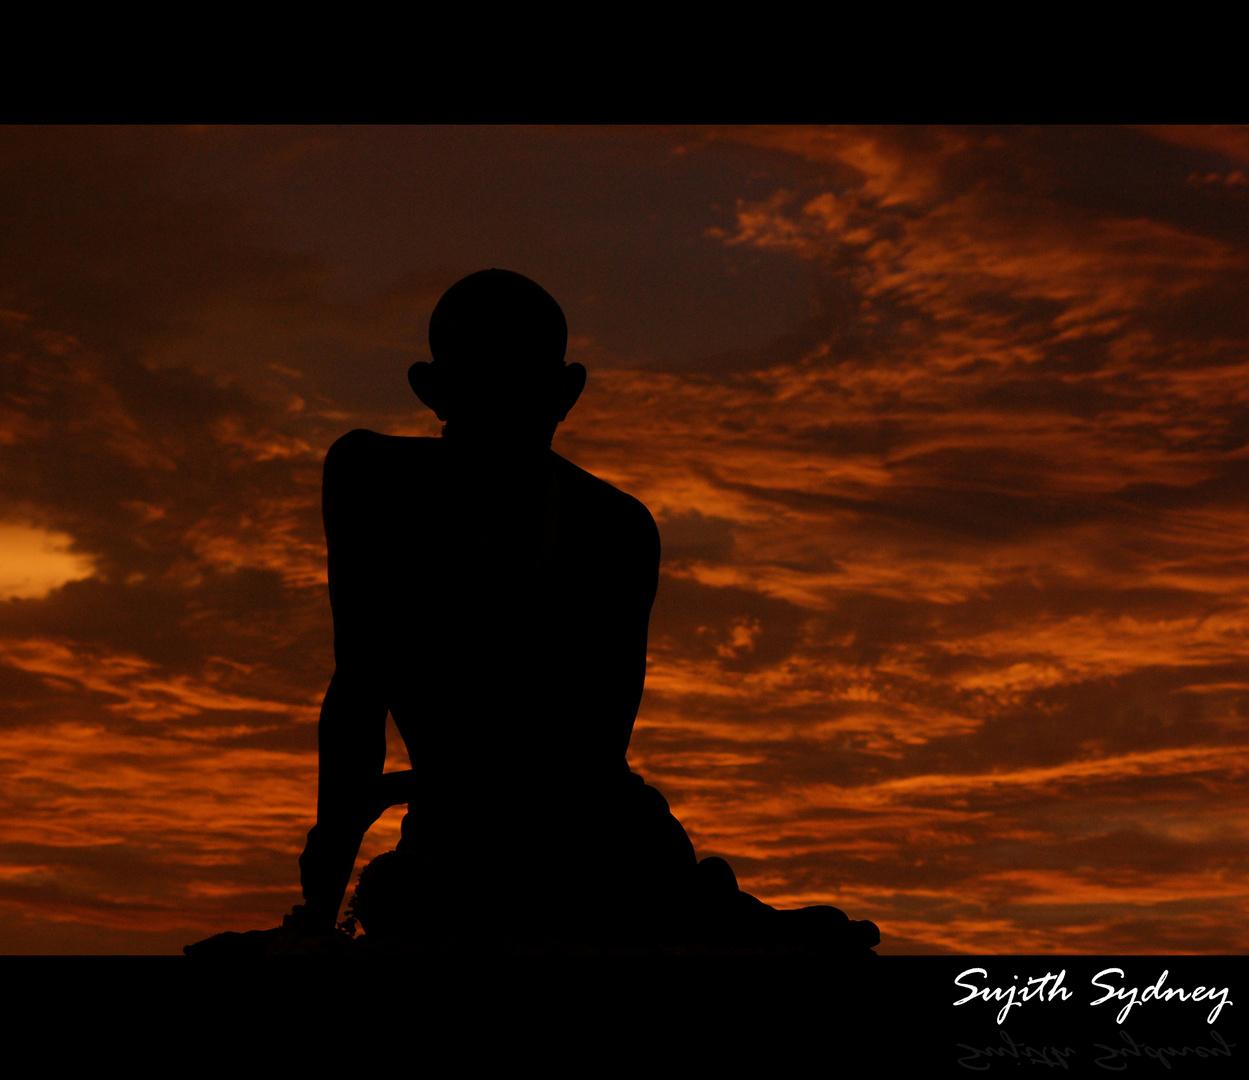 Dedicated to the memory of Gandhi